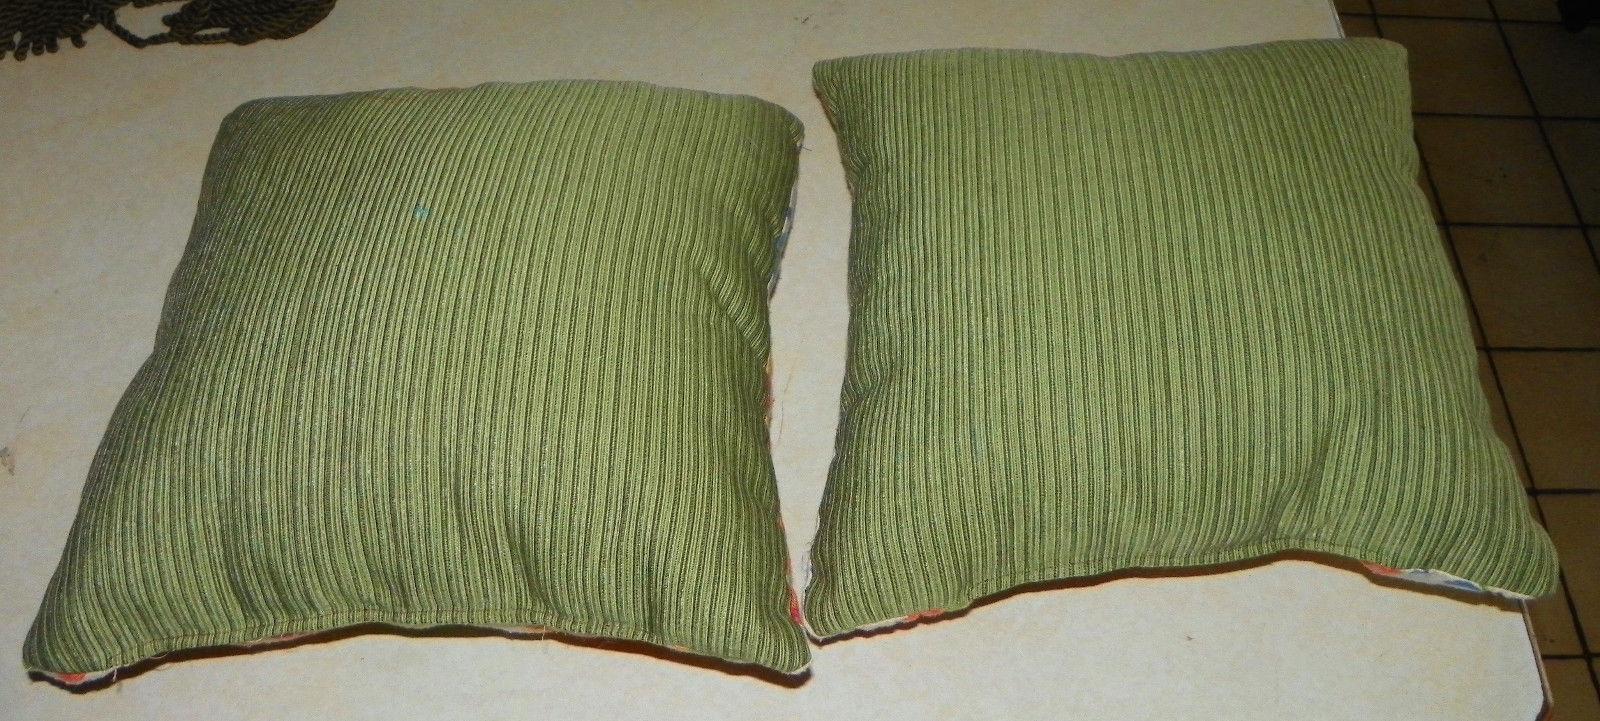 Pair of Green Blue Flower Print Throw Pillows  16 X 16